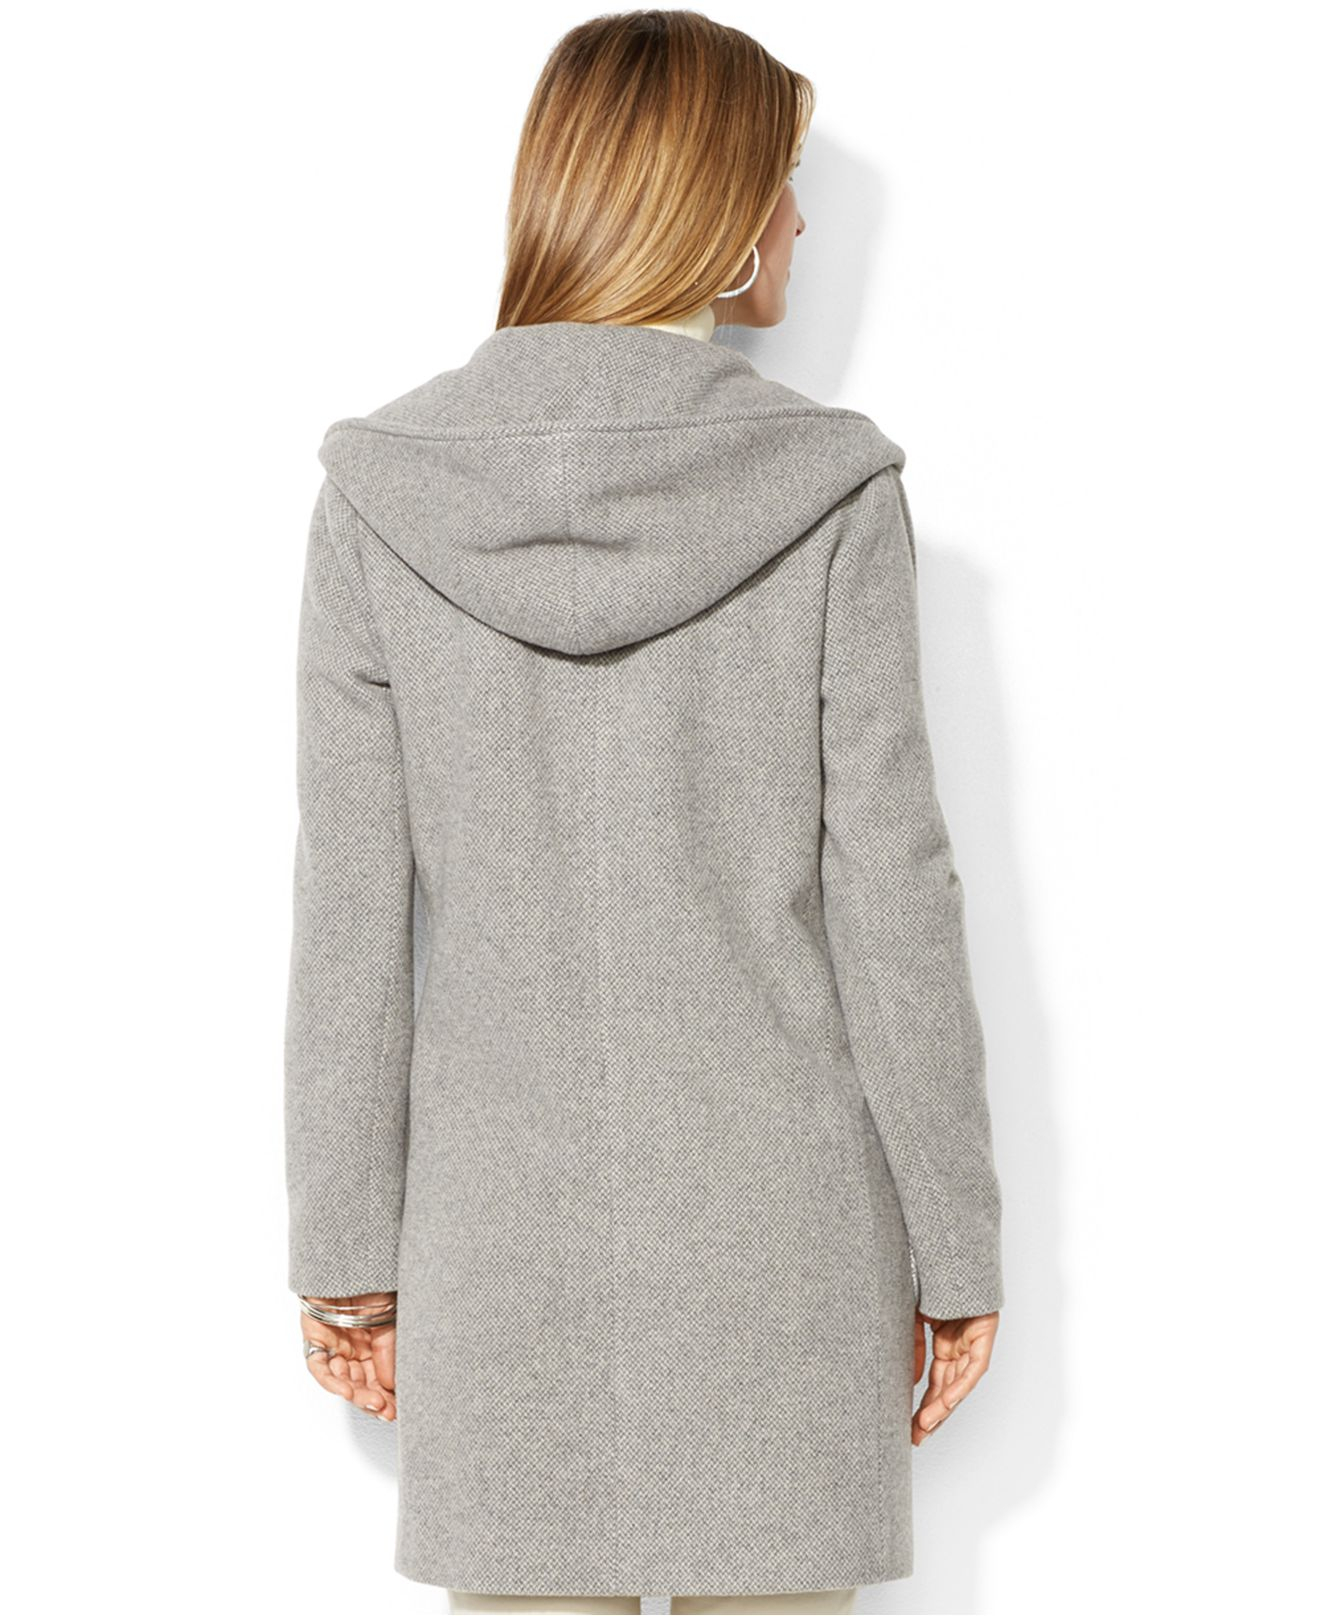 2c8d8969283e0 Lyst - Lauren by Ralph Lauren Hooded Herringbone Wool-Cashmere-Blend ...